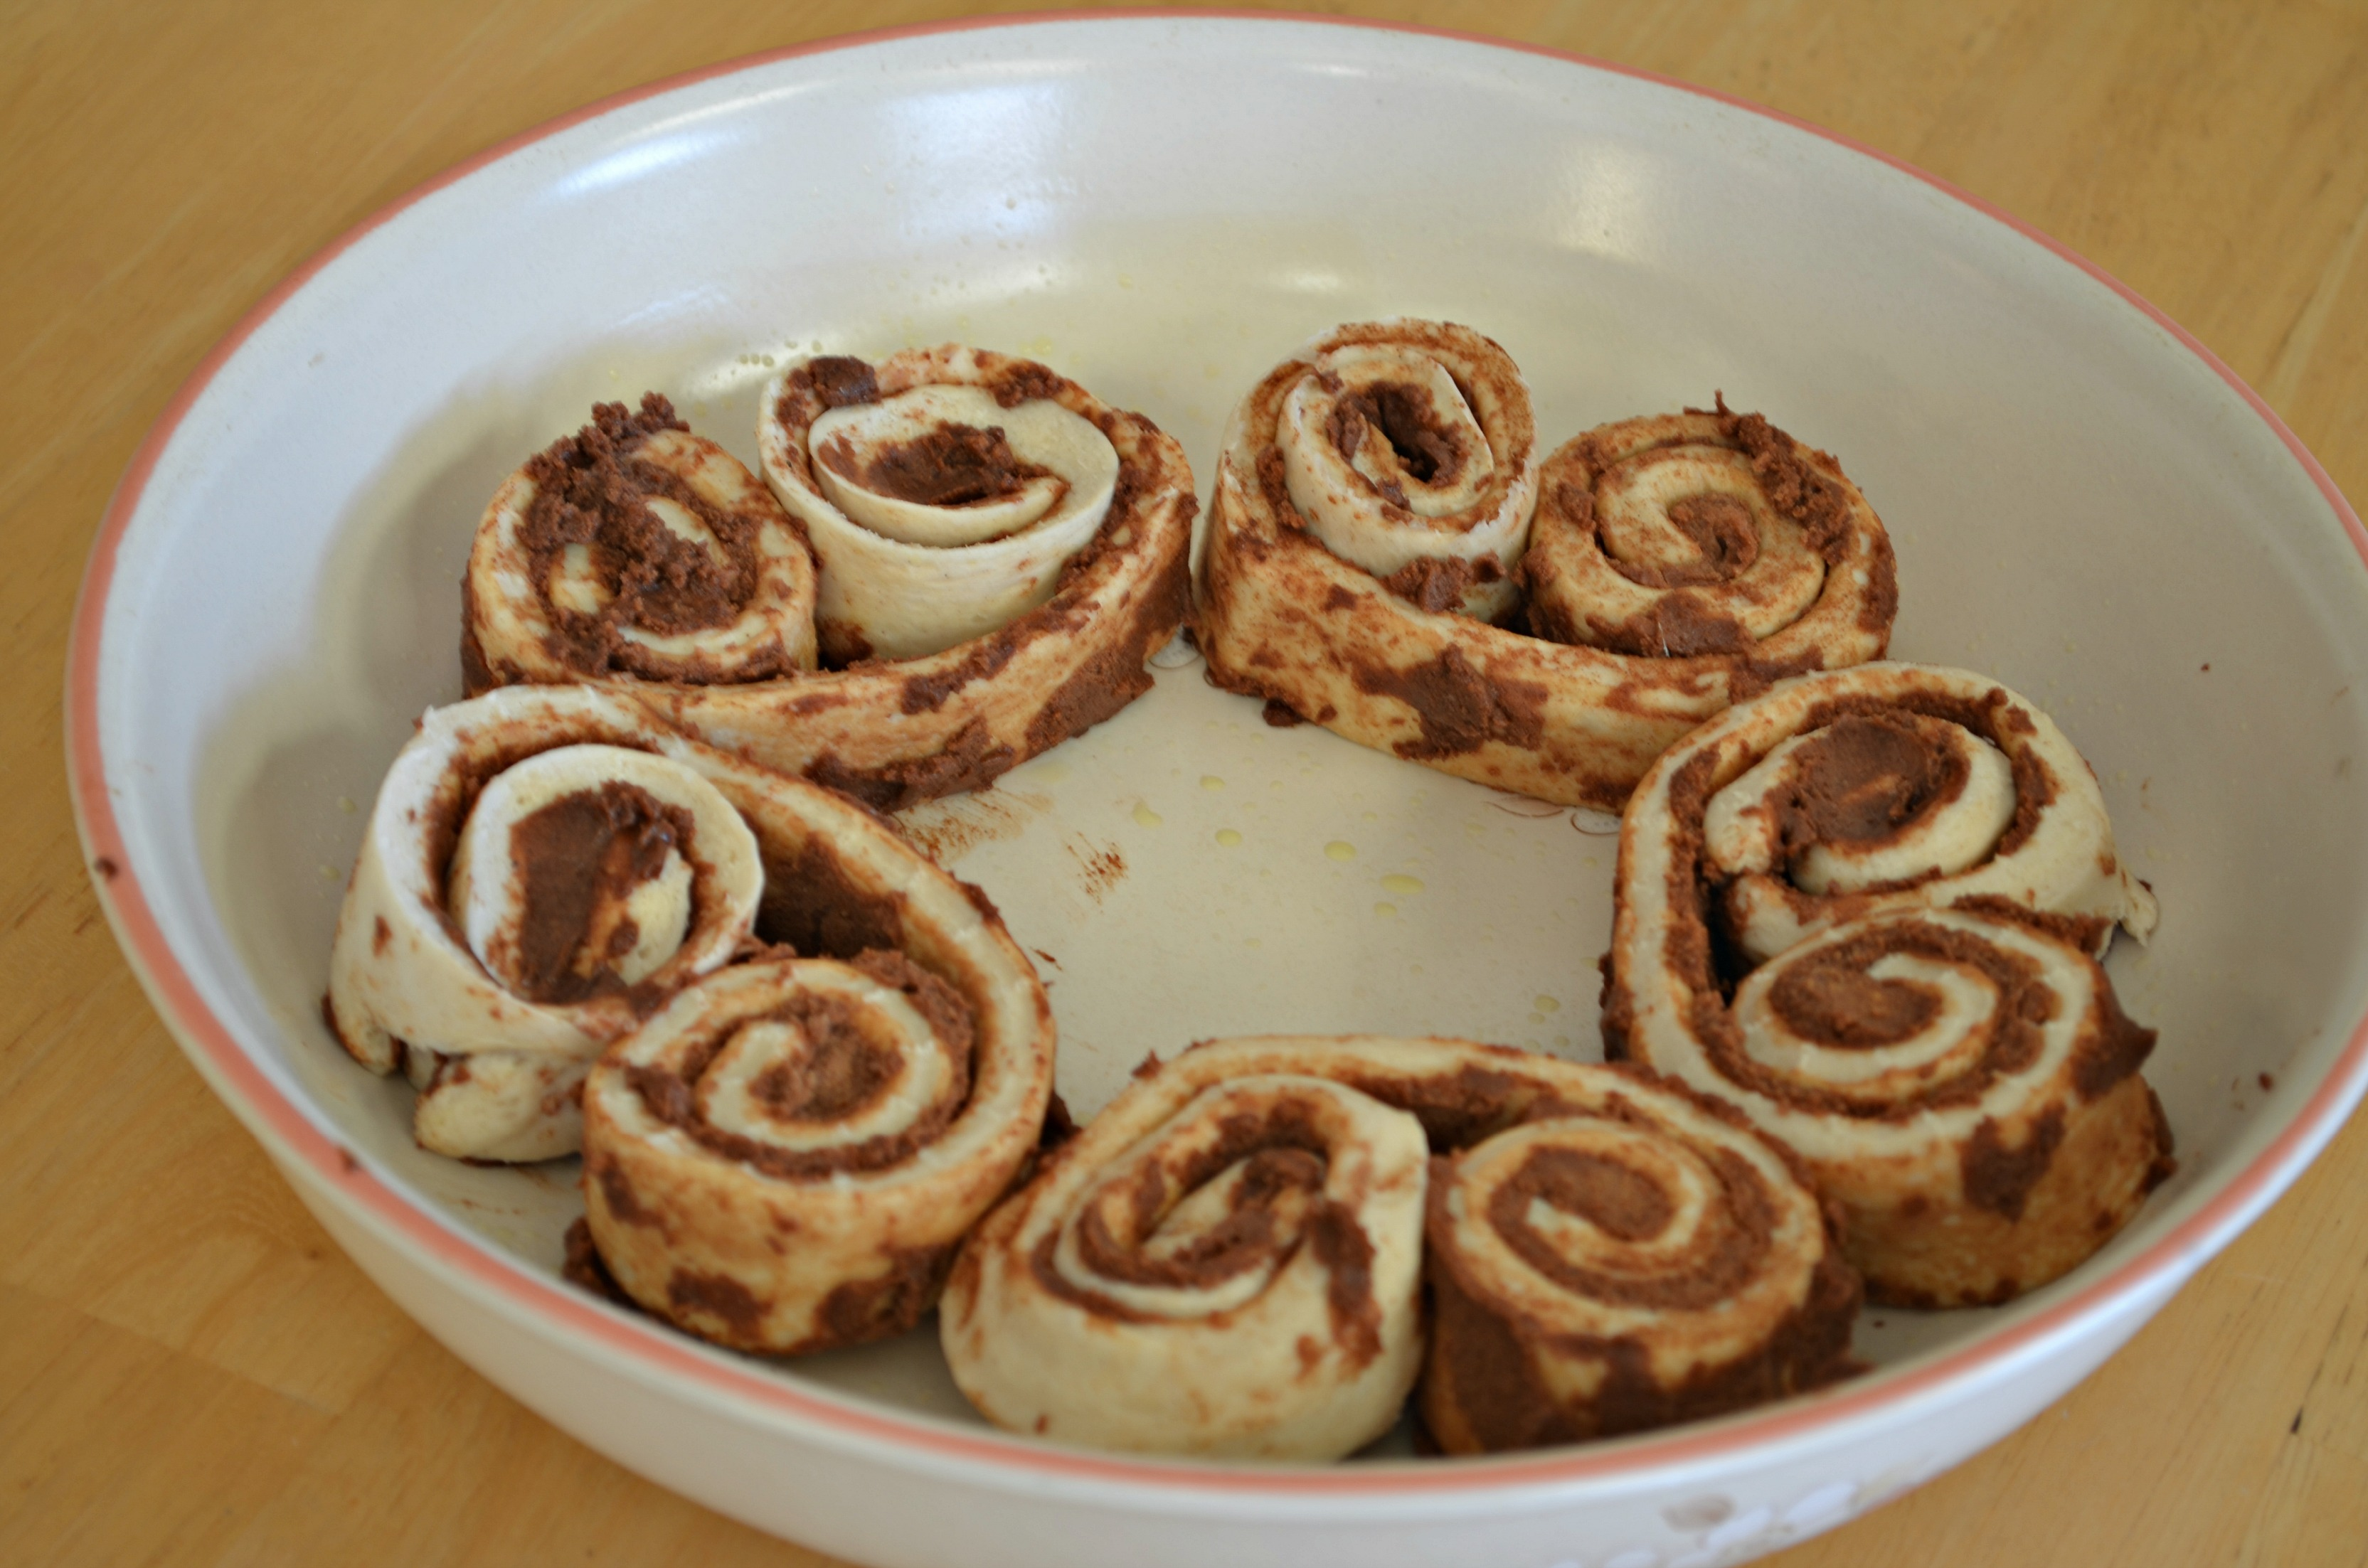 uncooked cinnamon rolls